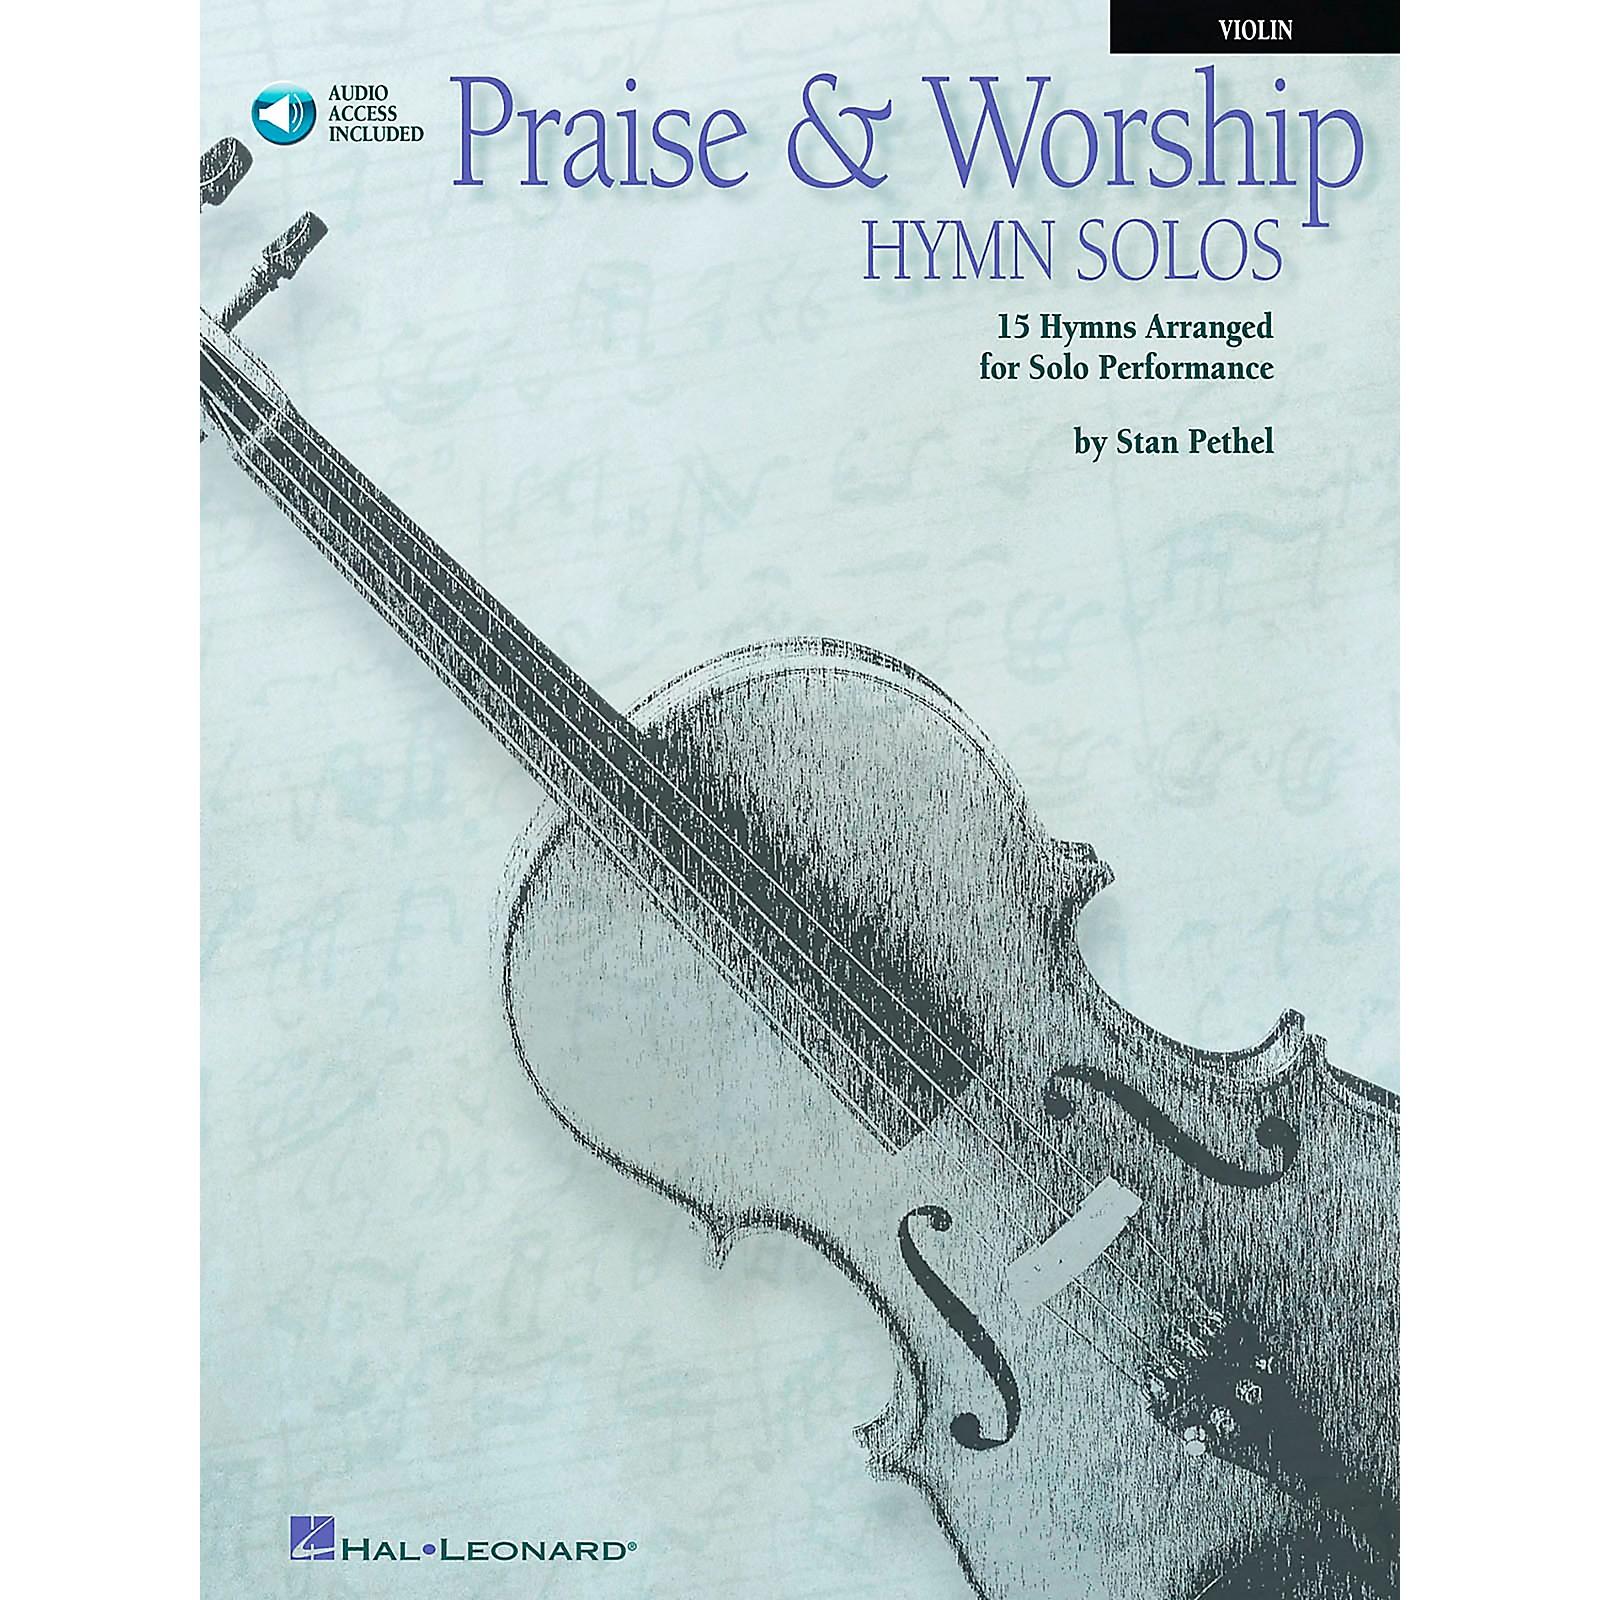 Hal Leonard Praise & Worship Hymn Solos - 15 Hymns Arranged for Solo Performance for Violin Book/CD Pkg